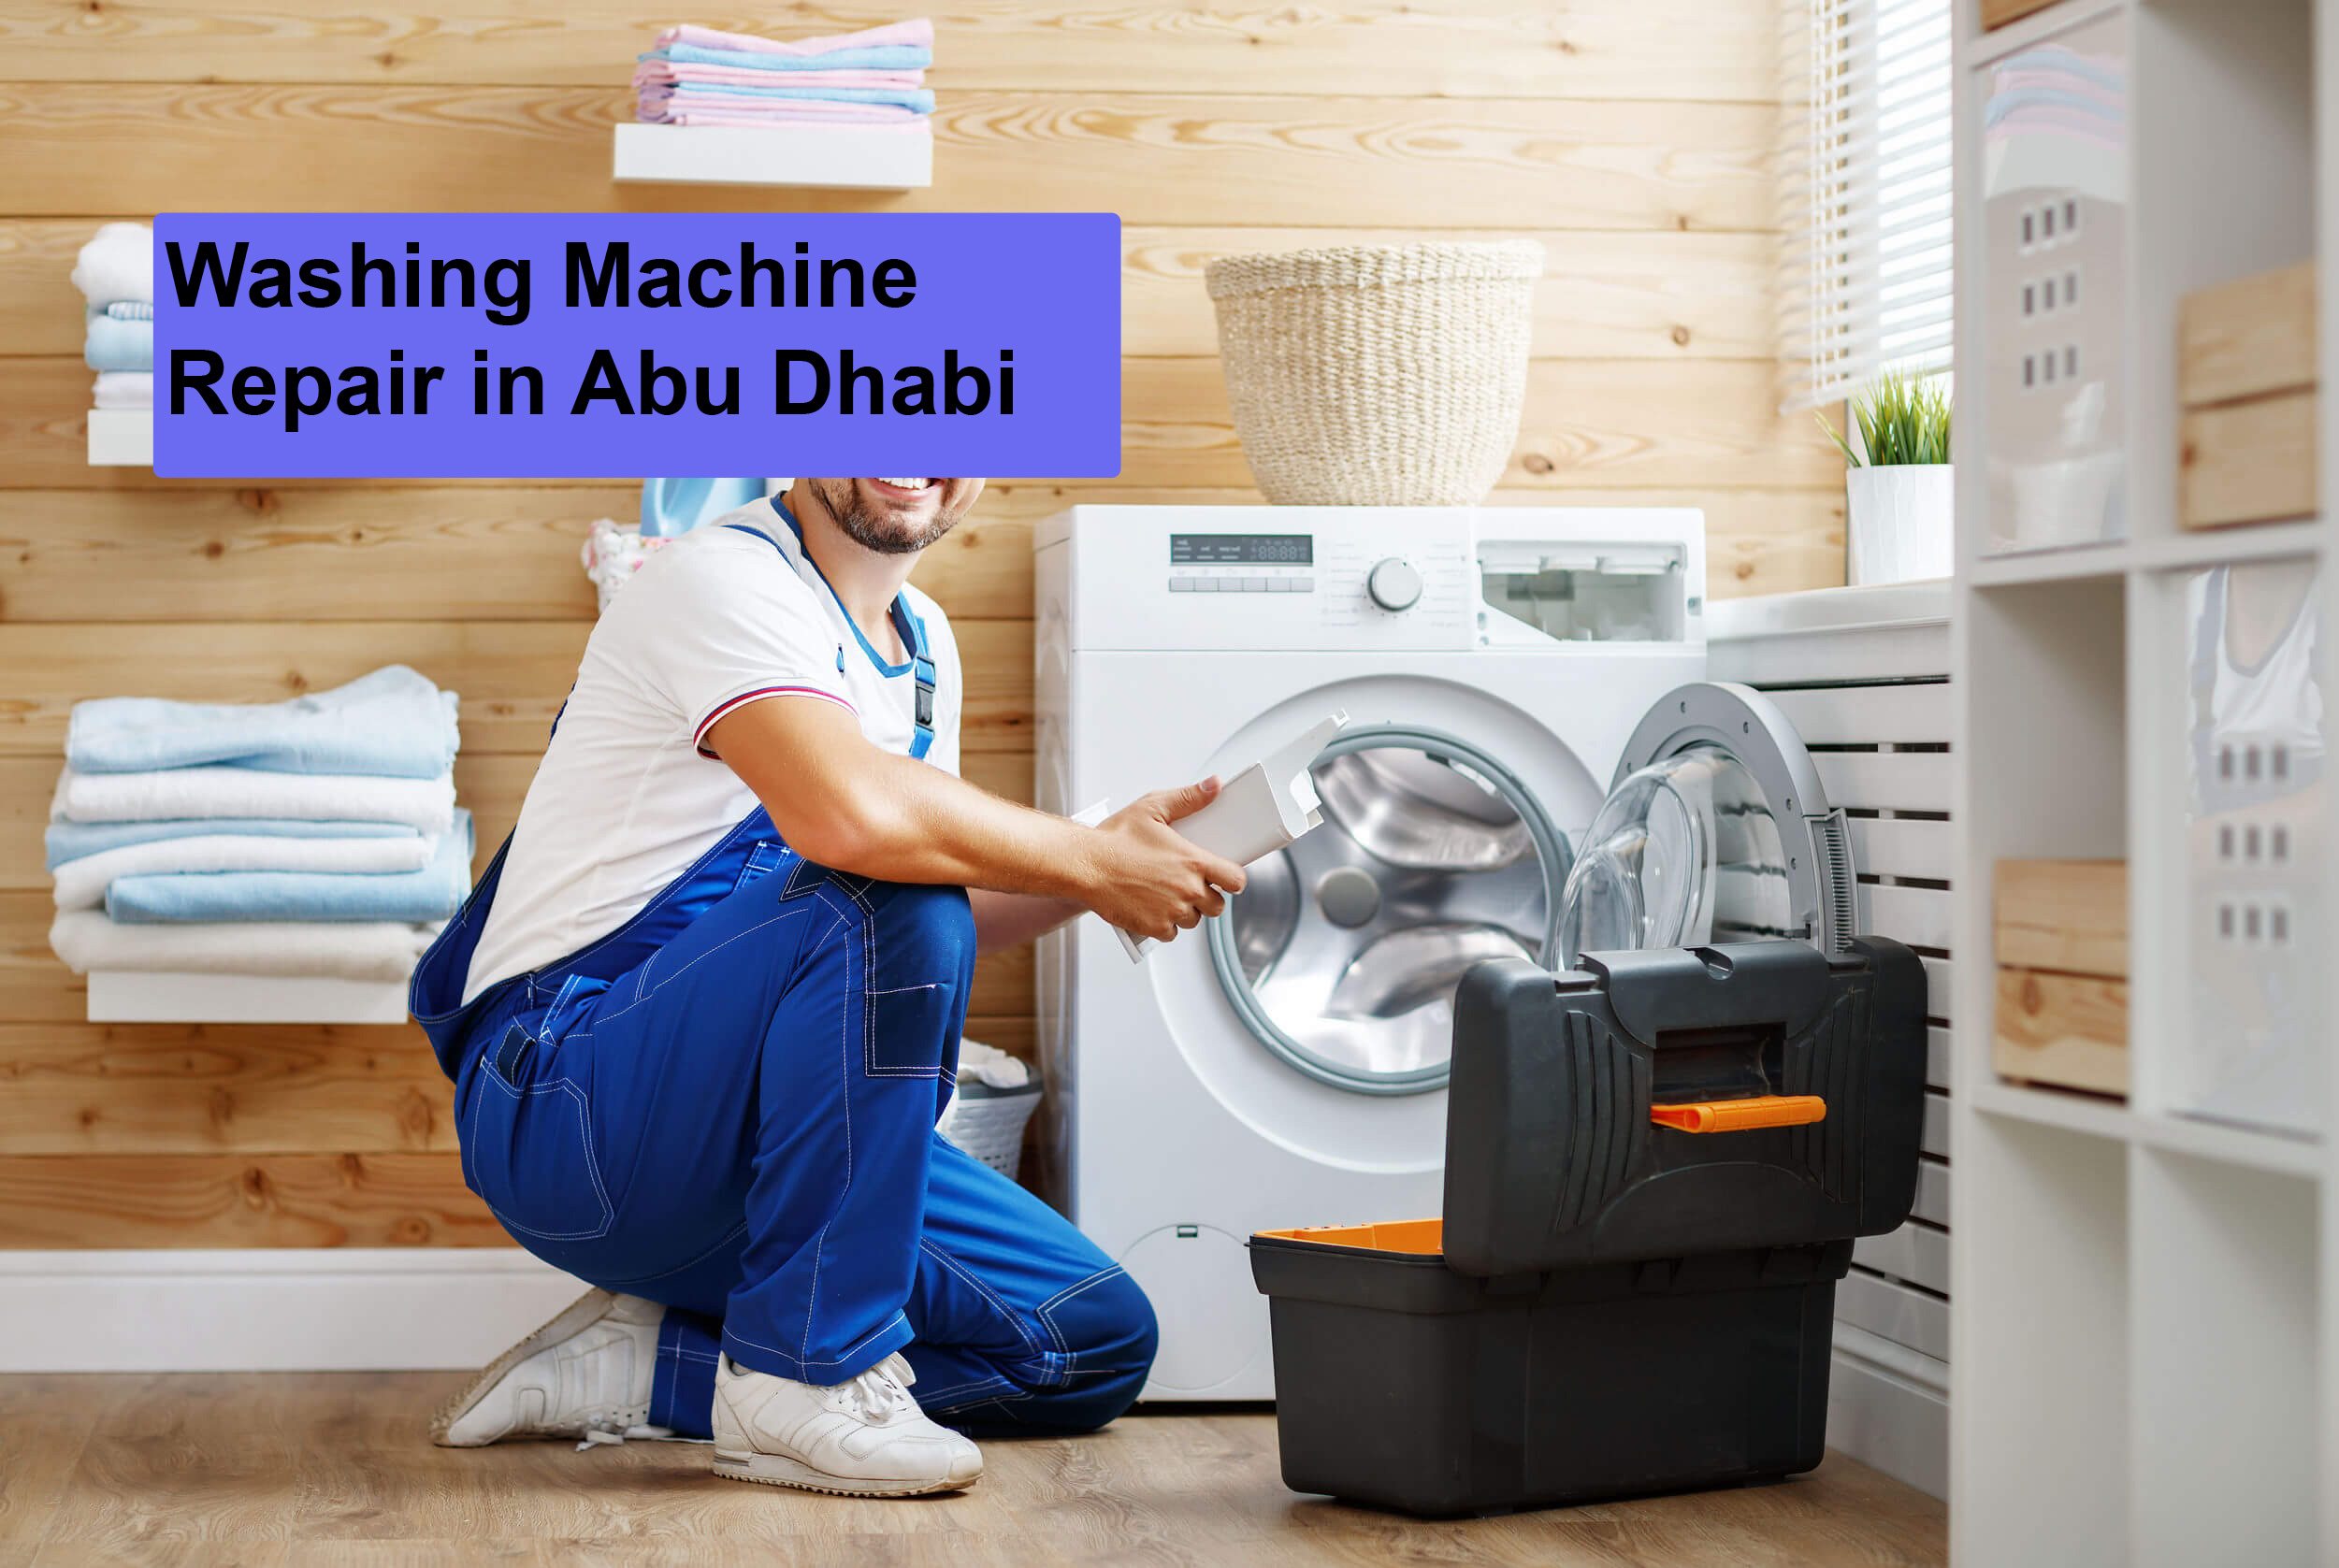 Washing Machine Repair Abu Dhabi 058-8332008